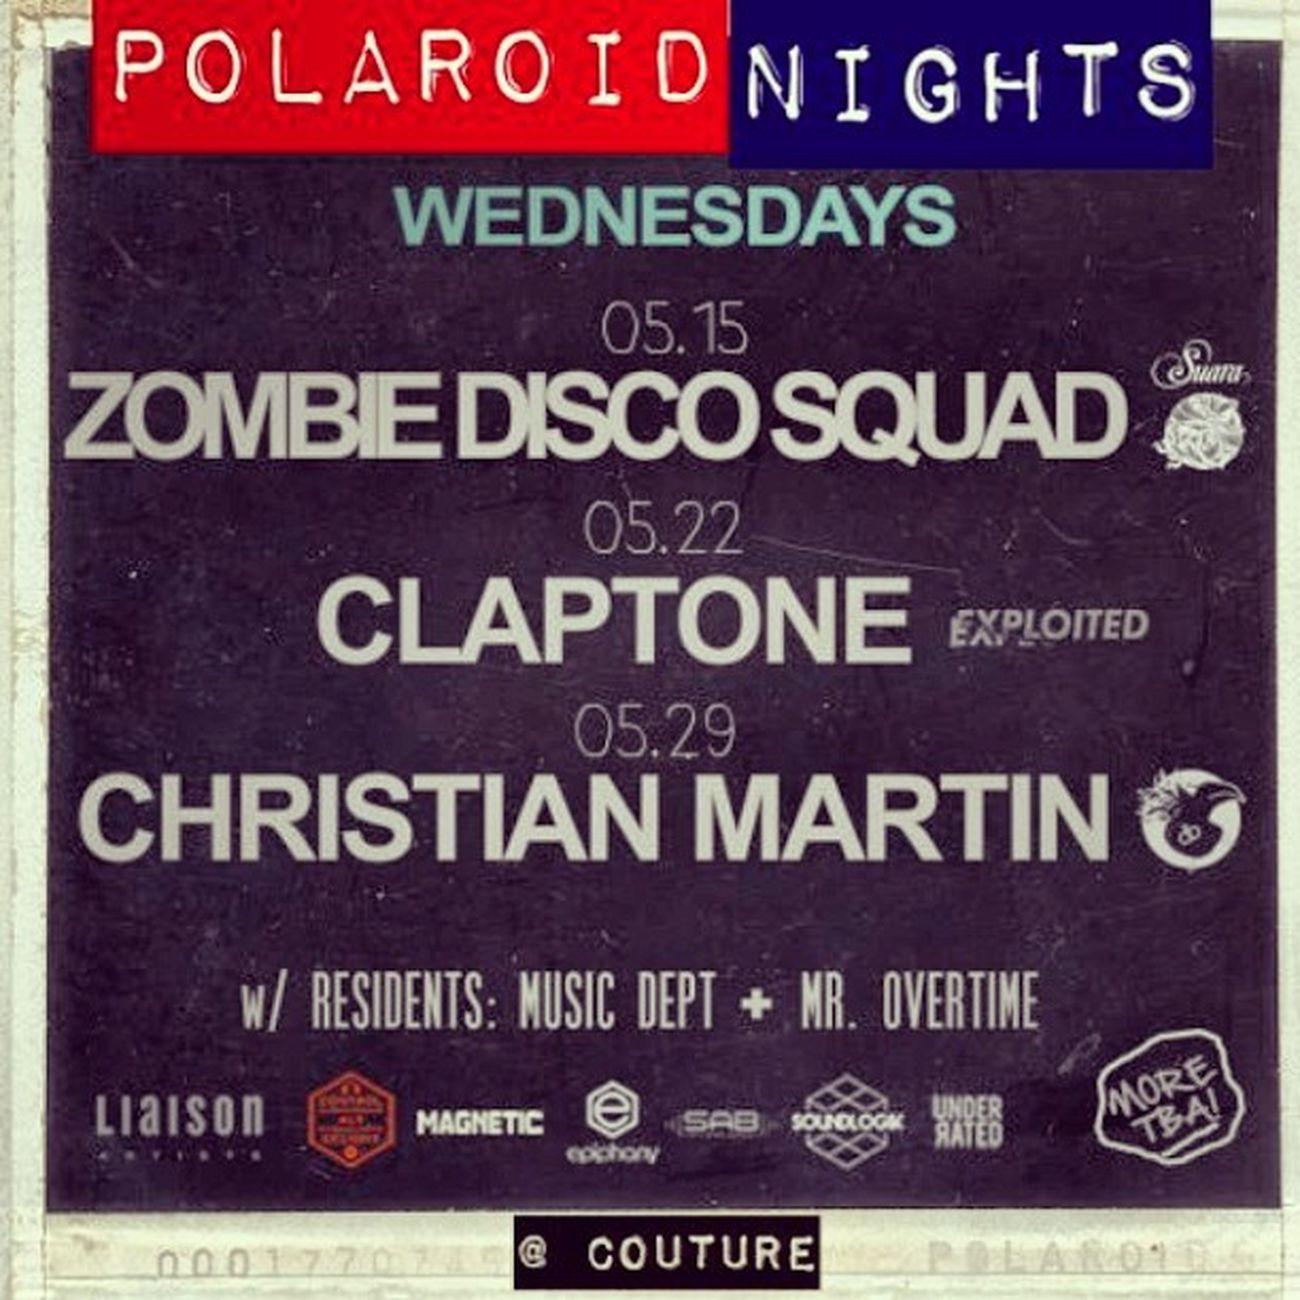 Polaroidnights Zombiediscosquad Claptone Christianmartin epiphanyepiphanypresentscouturelahollywoodwednesdayspartydeephousehousemusicpartylacalimay20132013flyer